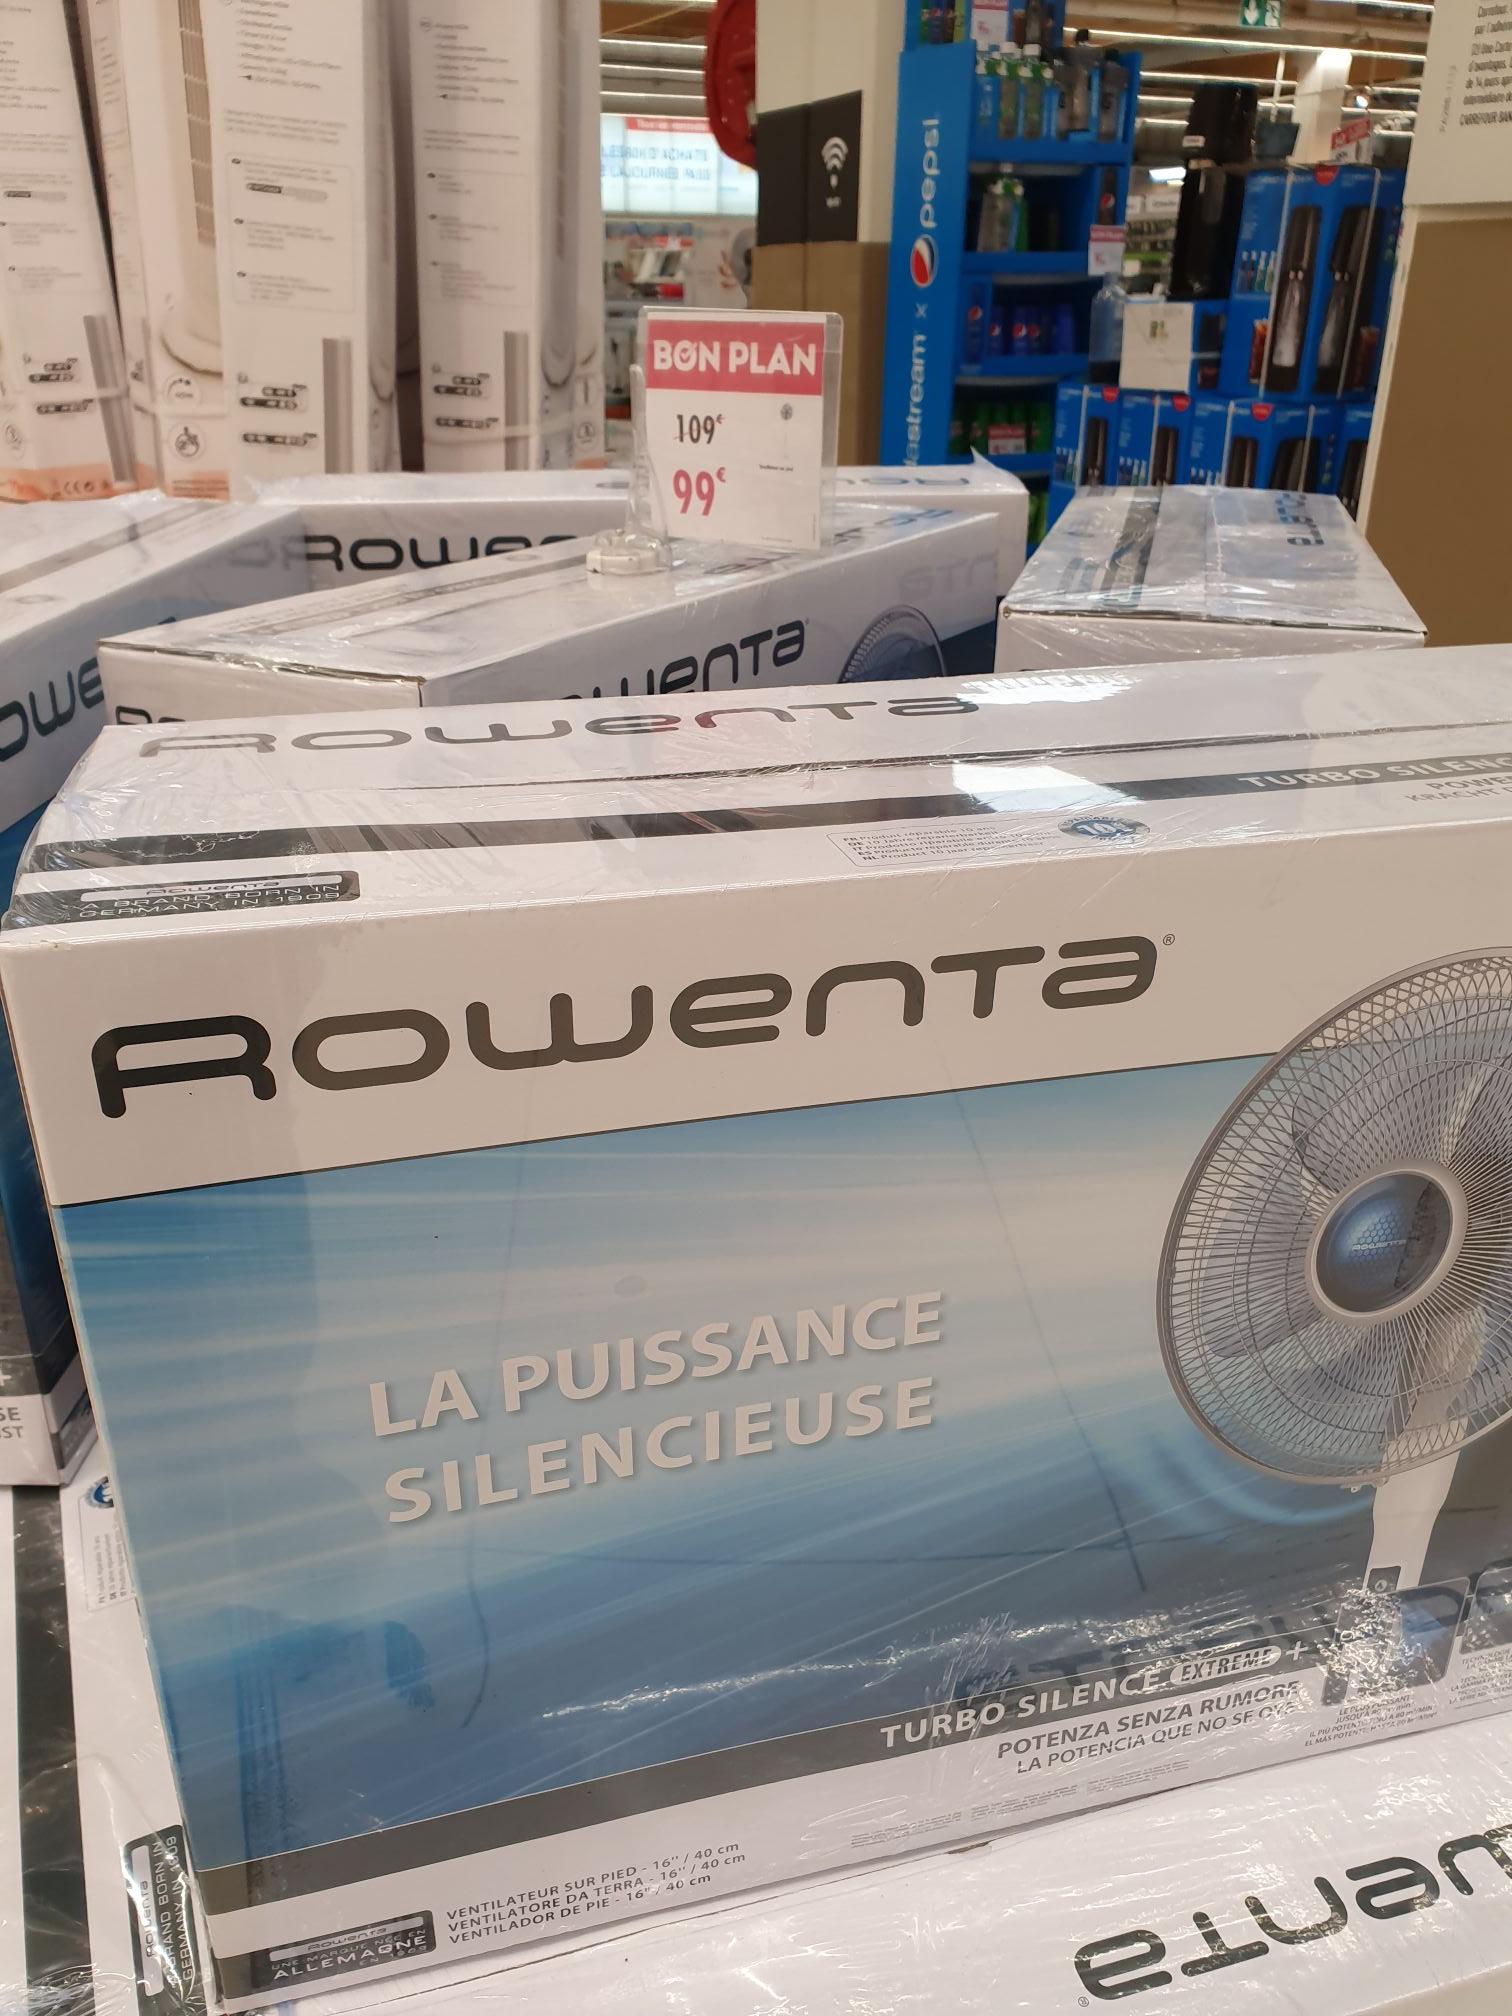 Ventillateur Rowenta Turbo Silence Extrême+ 35dB avec télécommande (VU5770F0) - Villeneuve-la-Garenne (92)